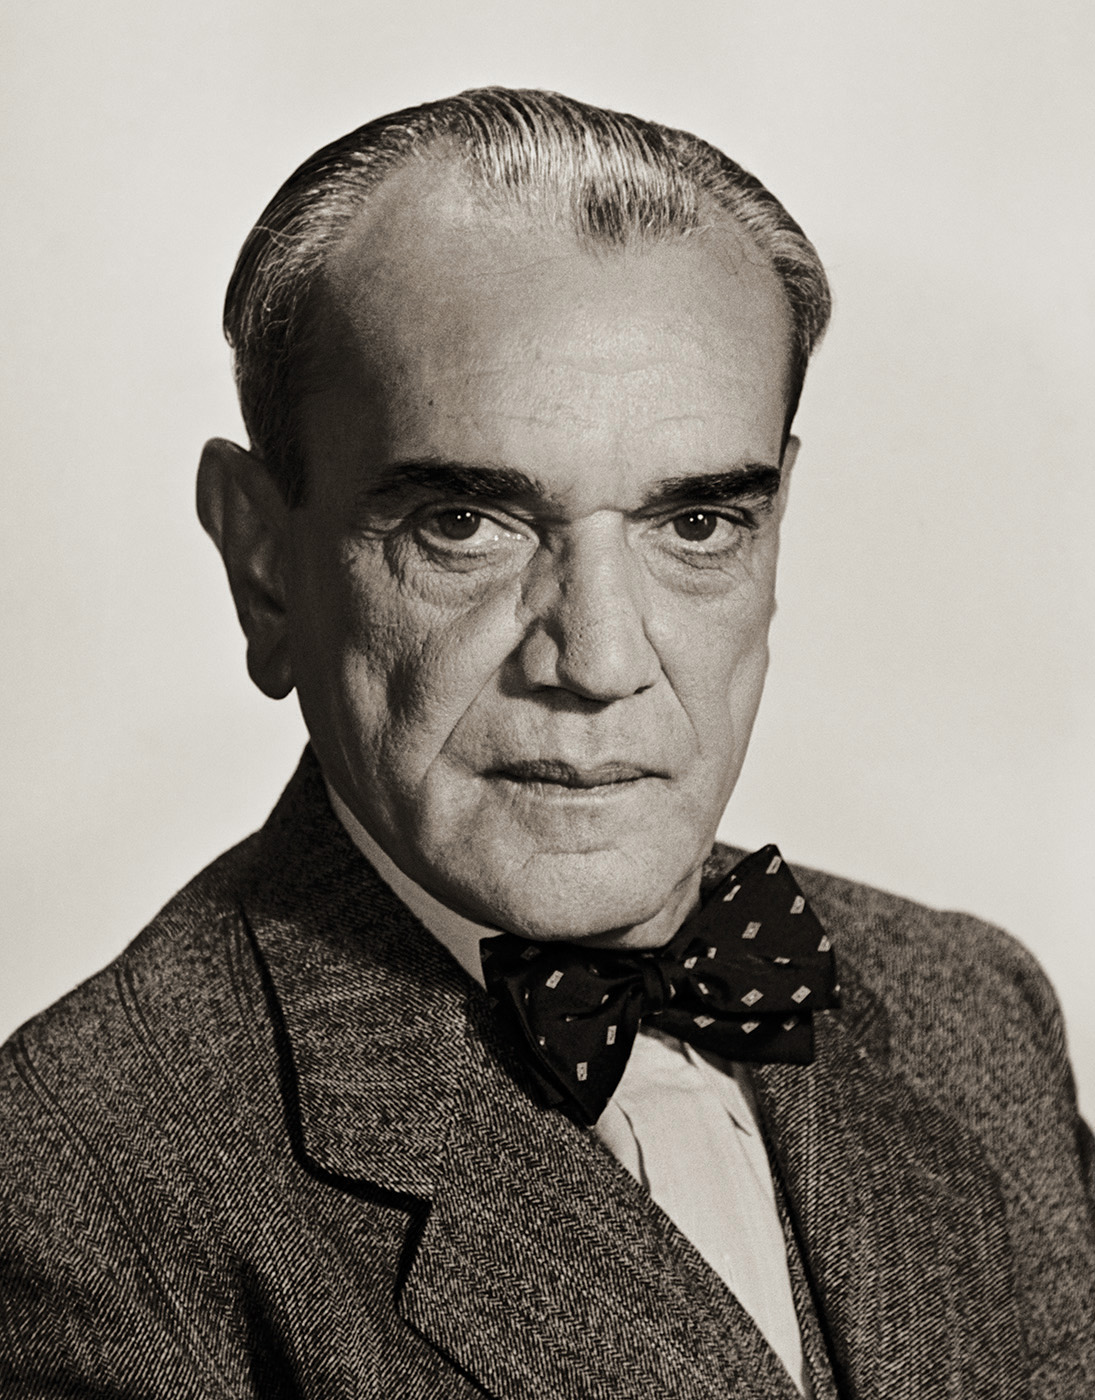 President Dr. Adolfo Ruiz Cortines of Mexico, Mexico, 1955